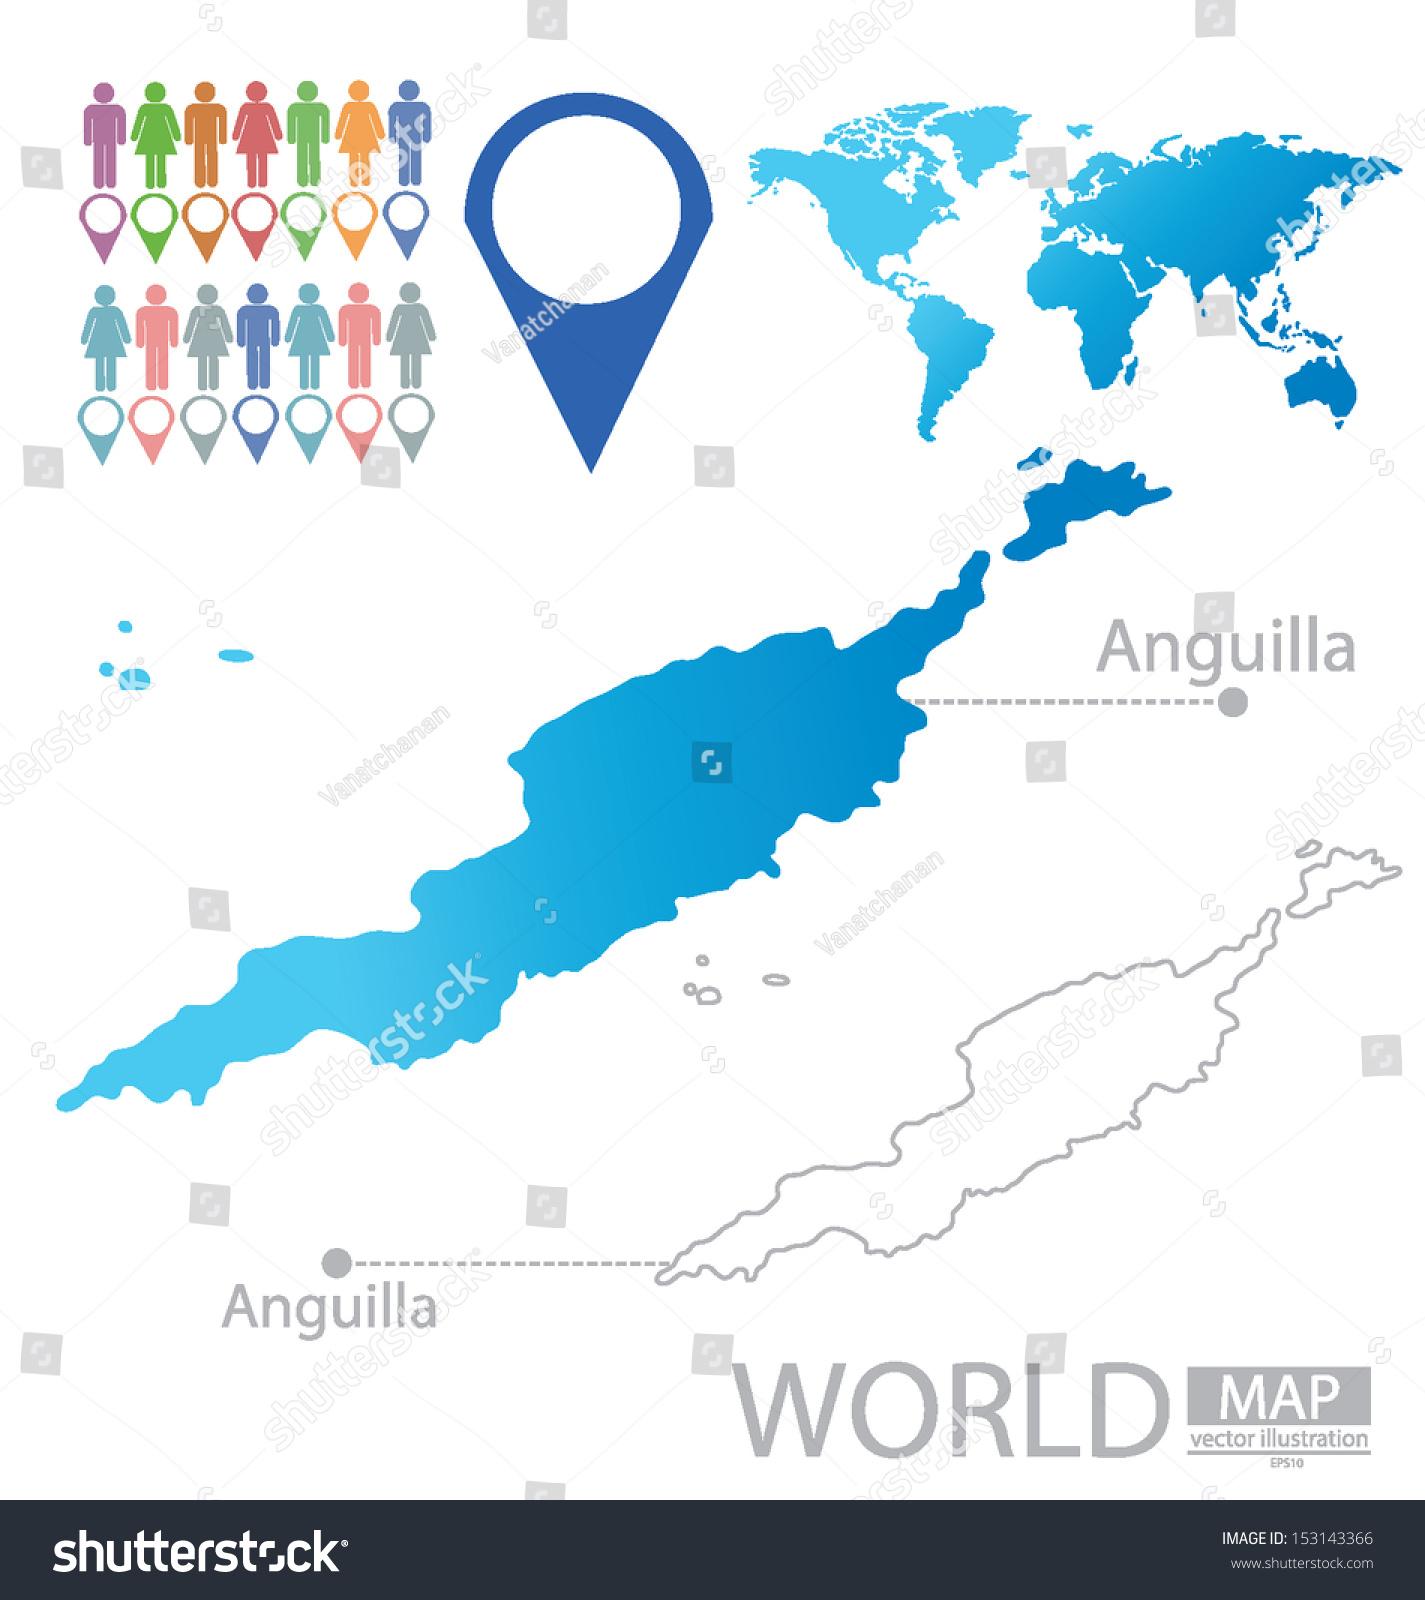 Anguilla World Map Vector Illustration Stock Vector 153143366